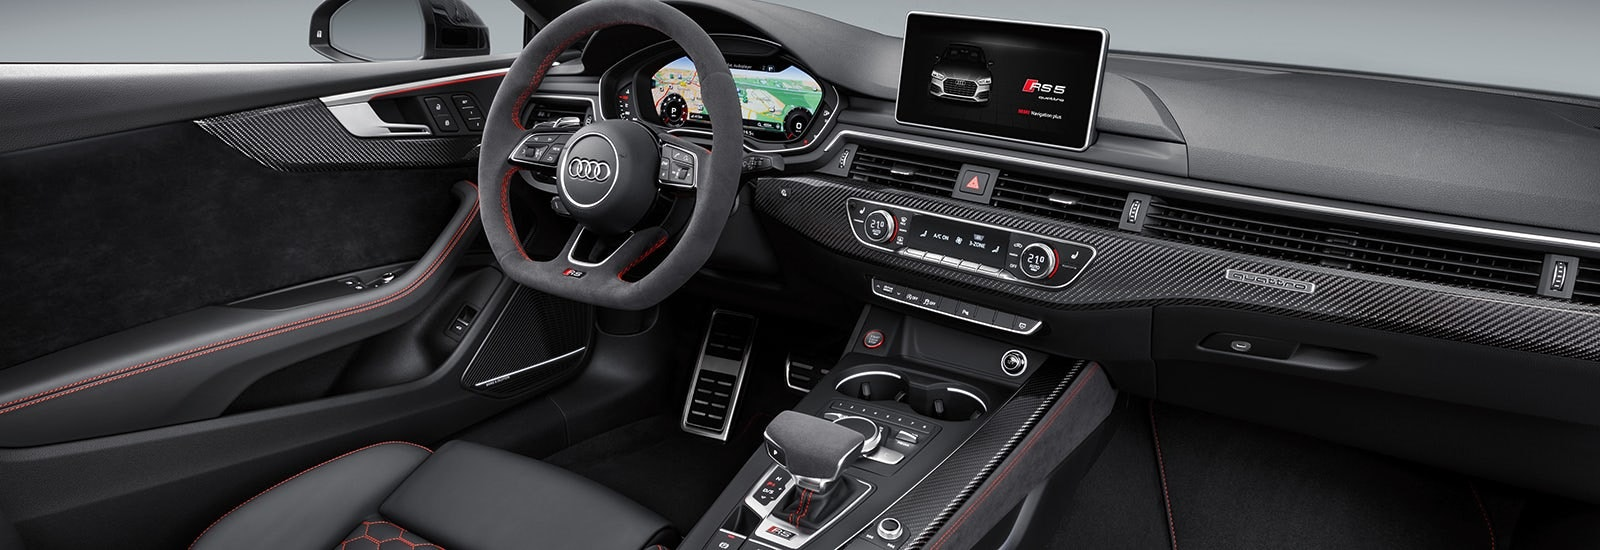 Audi rs5 convertible 2019 17